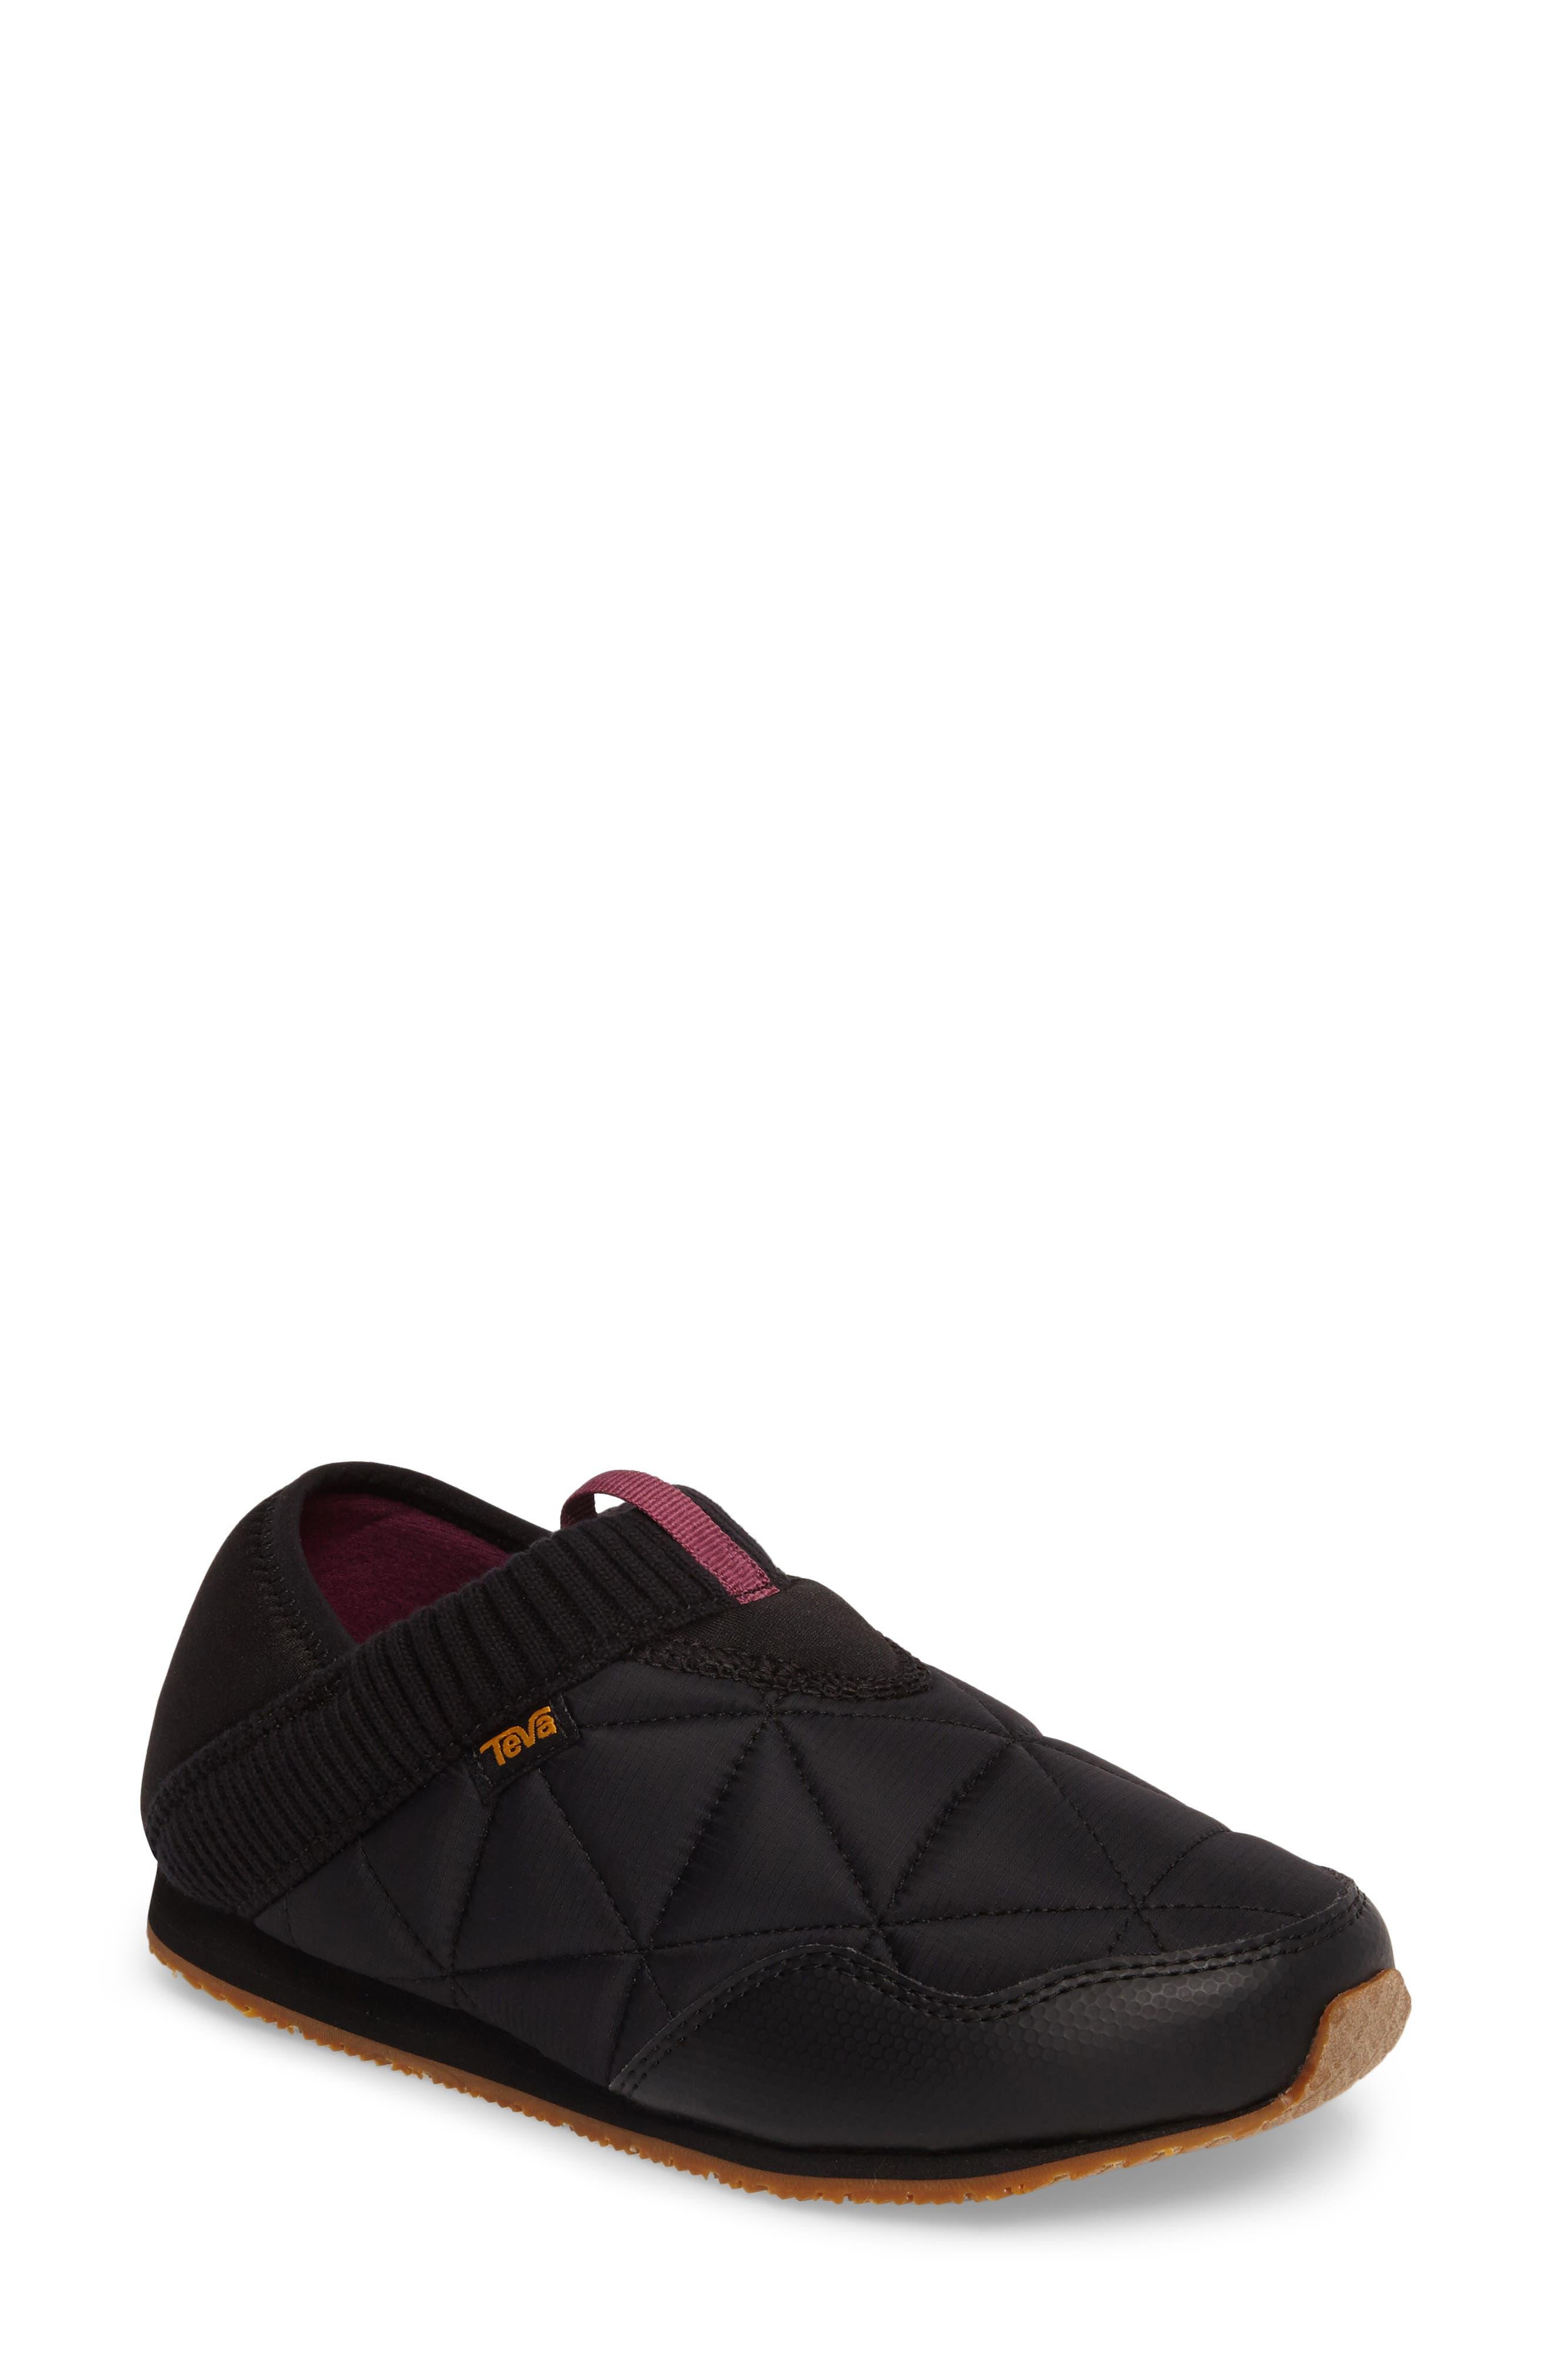 TEVA Ember Convertible Slip-On, Main, color, BLACK FABRIC